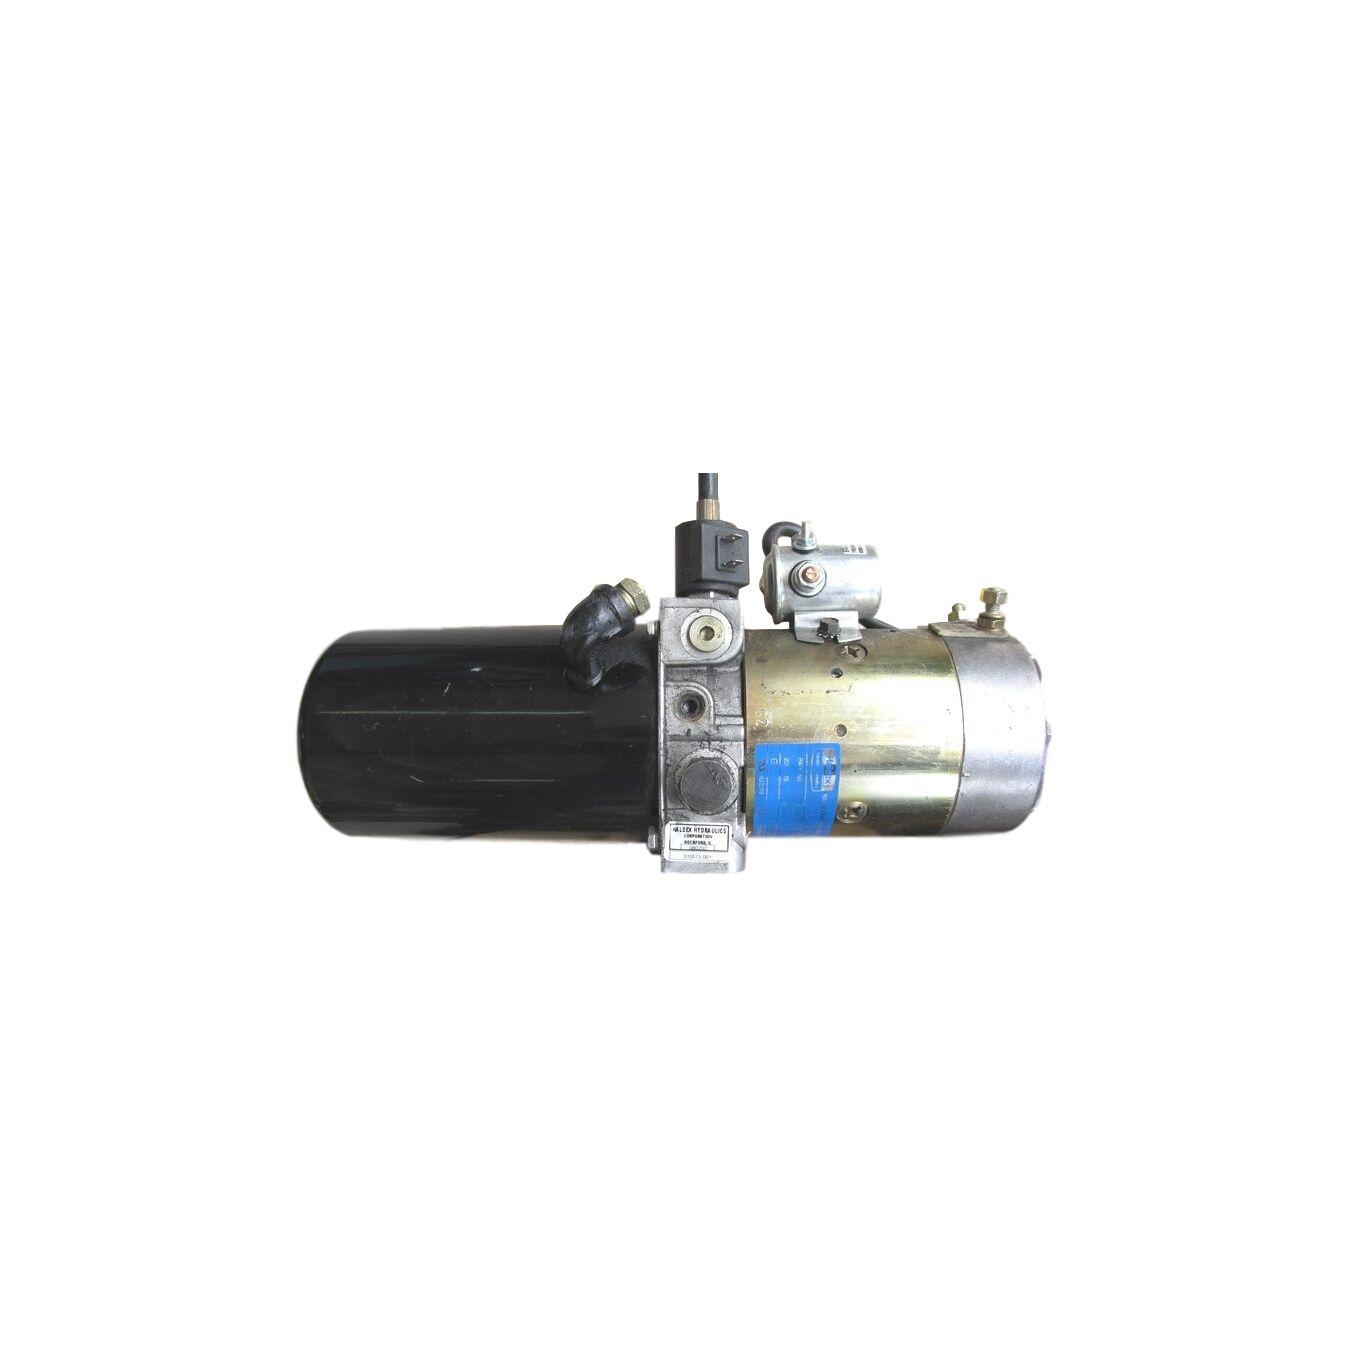 Haldex Hydraulic Power Unit Schematic Double Acting 12 Volt Pump Wiring Diagram 24 Dc Electronic Pumps Hydraulics Manuals